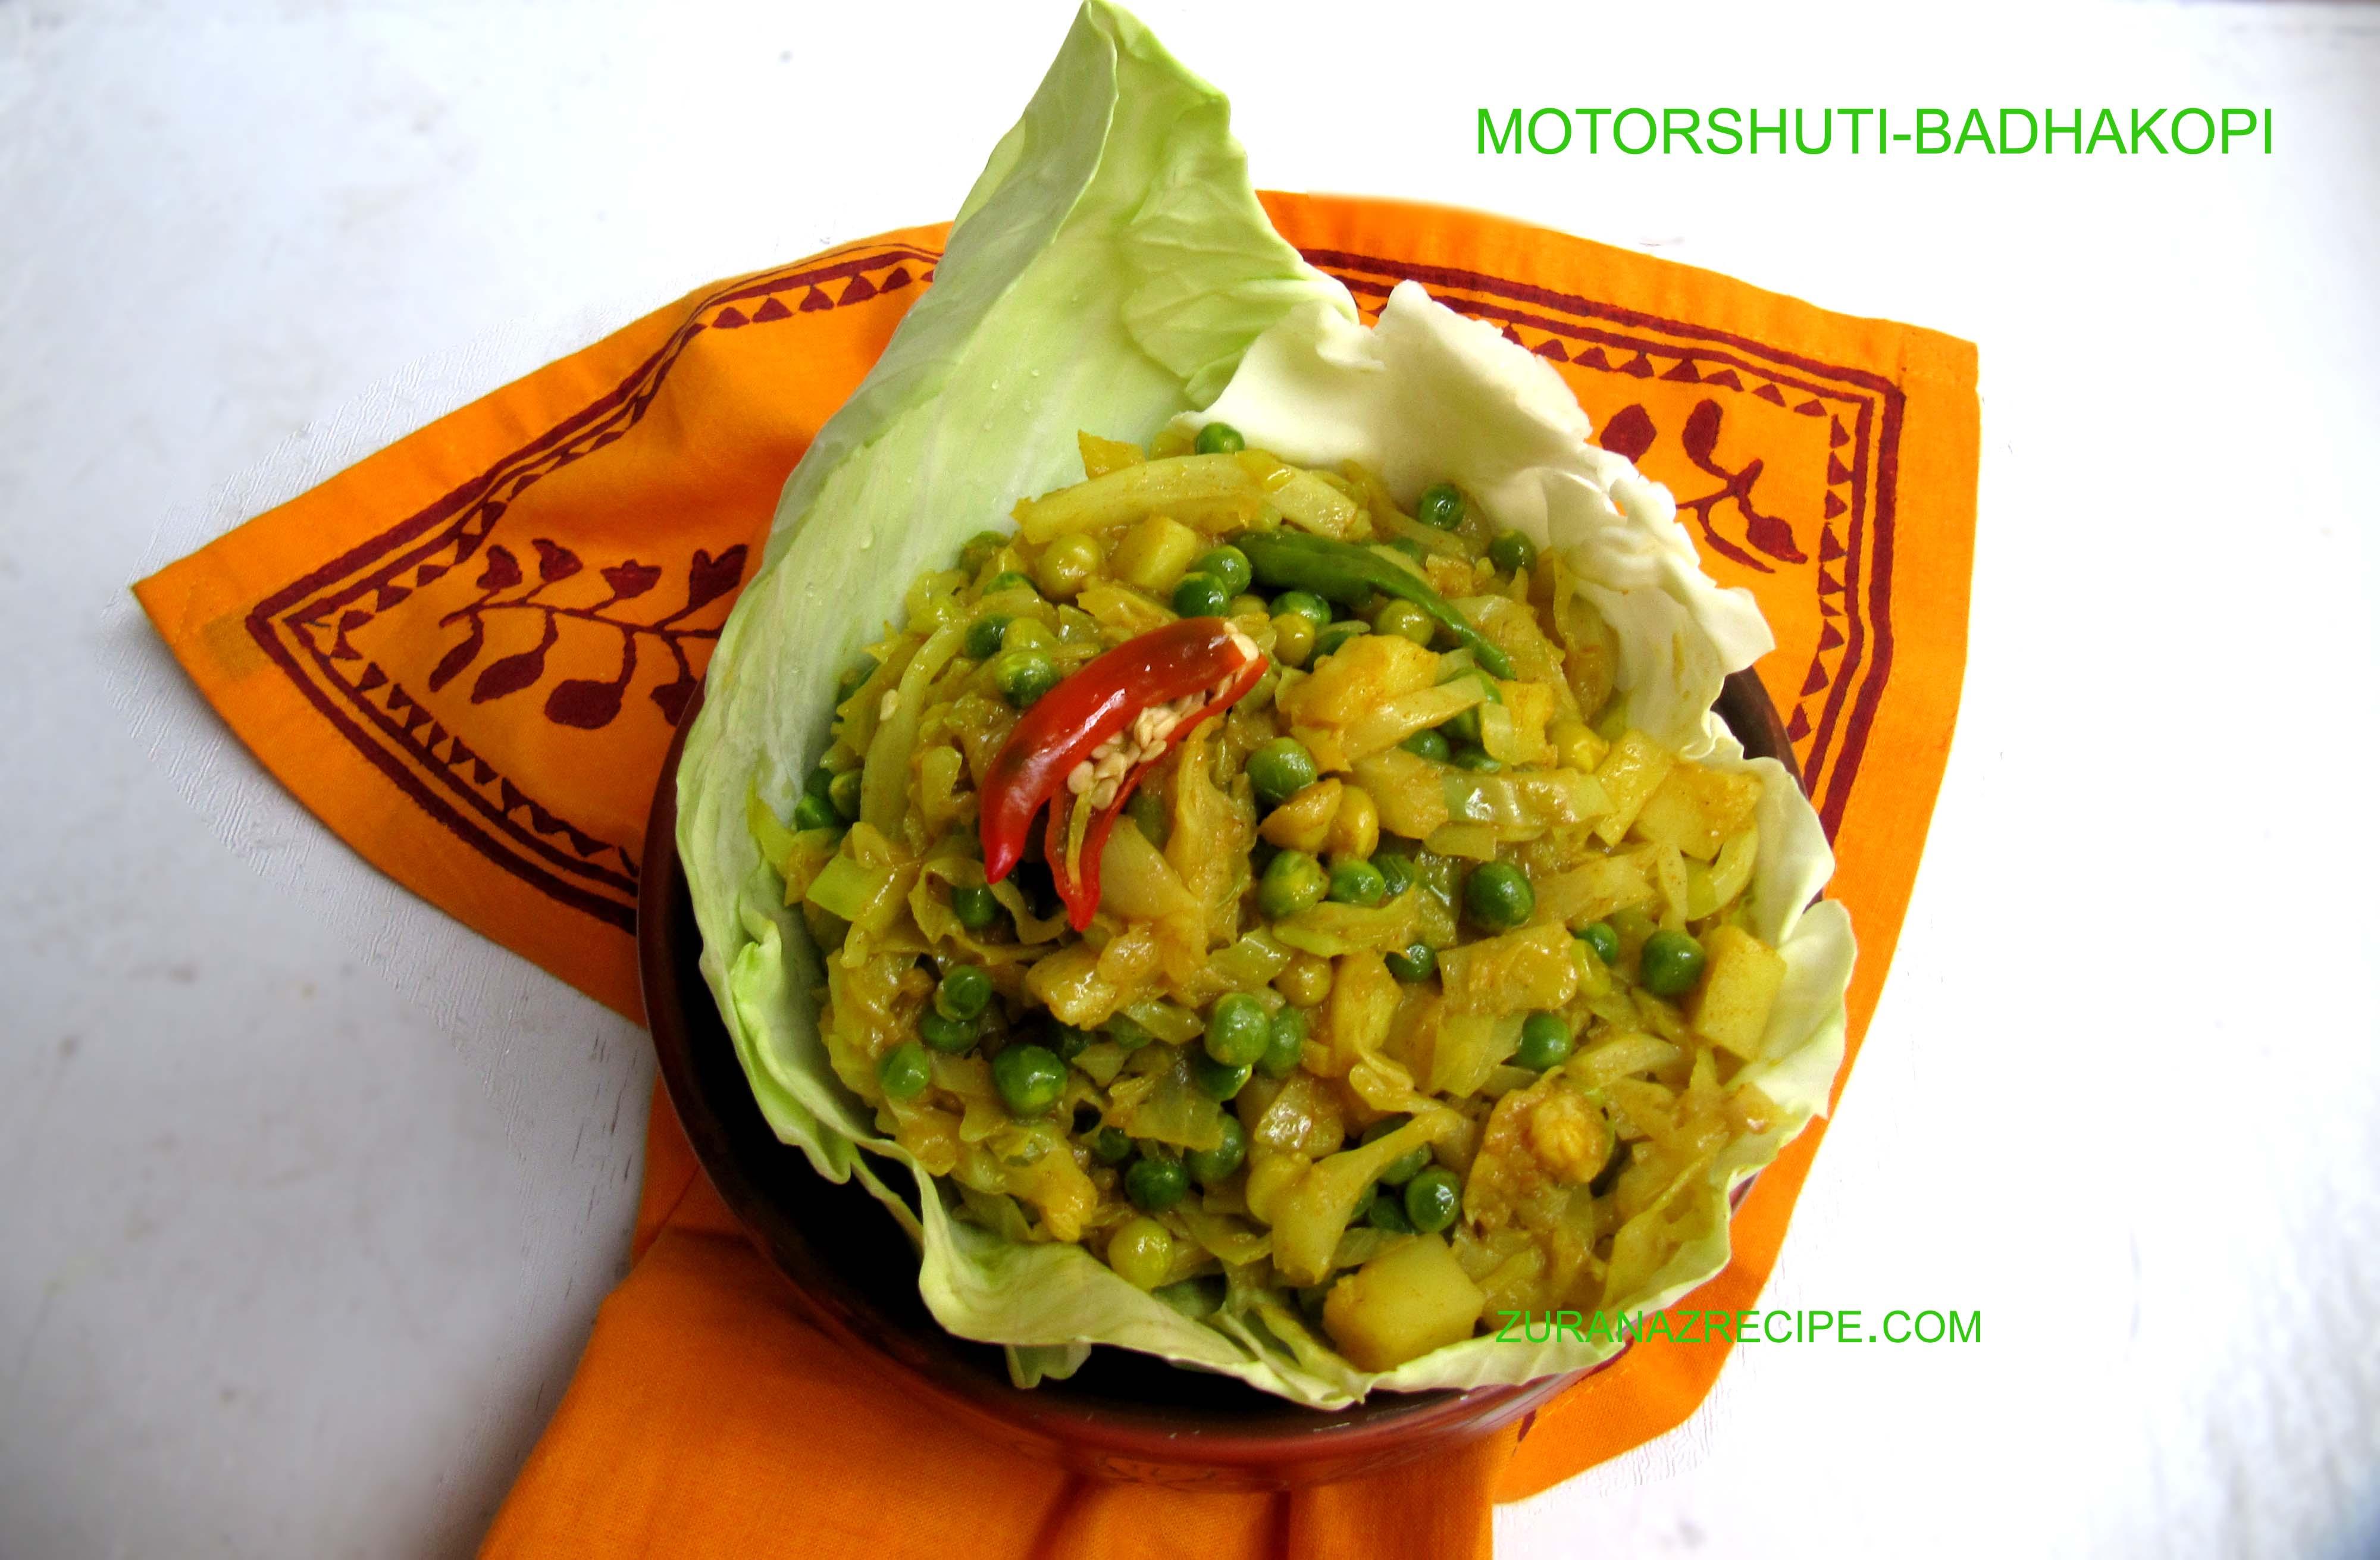 Motorshuti-Badhakopi Bhaji/Green Peas-Cabbage Bhaji